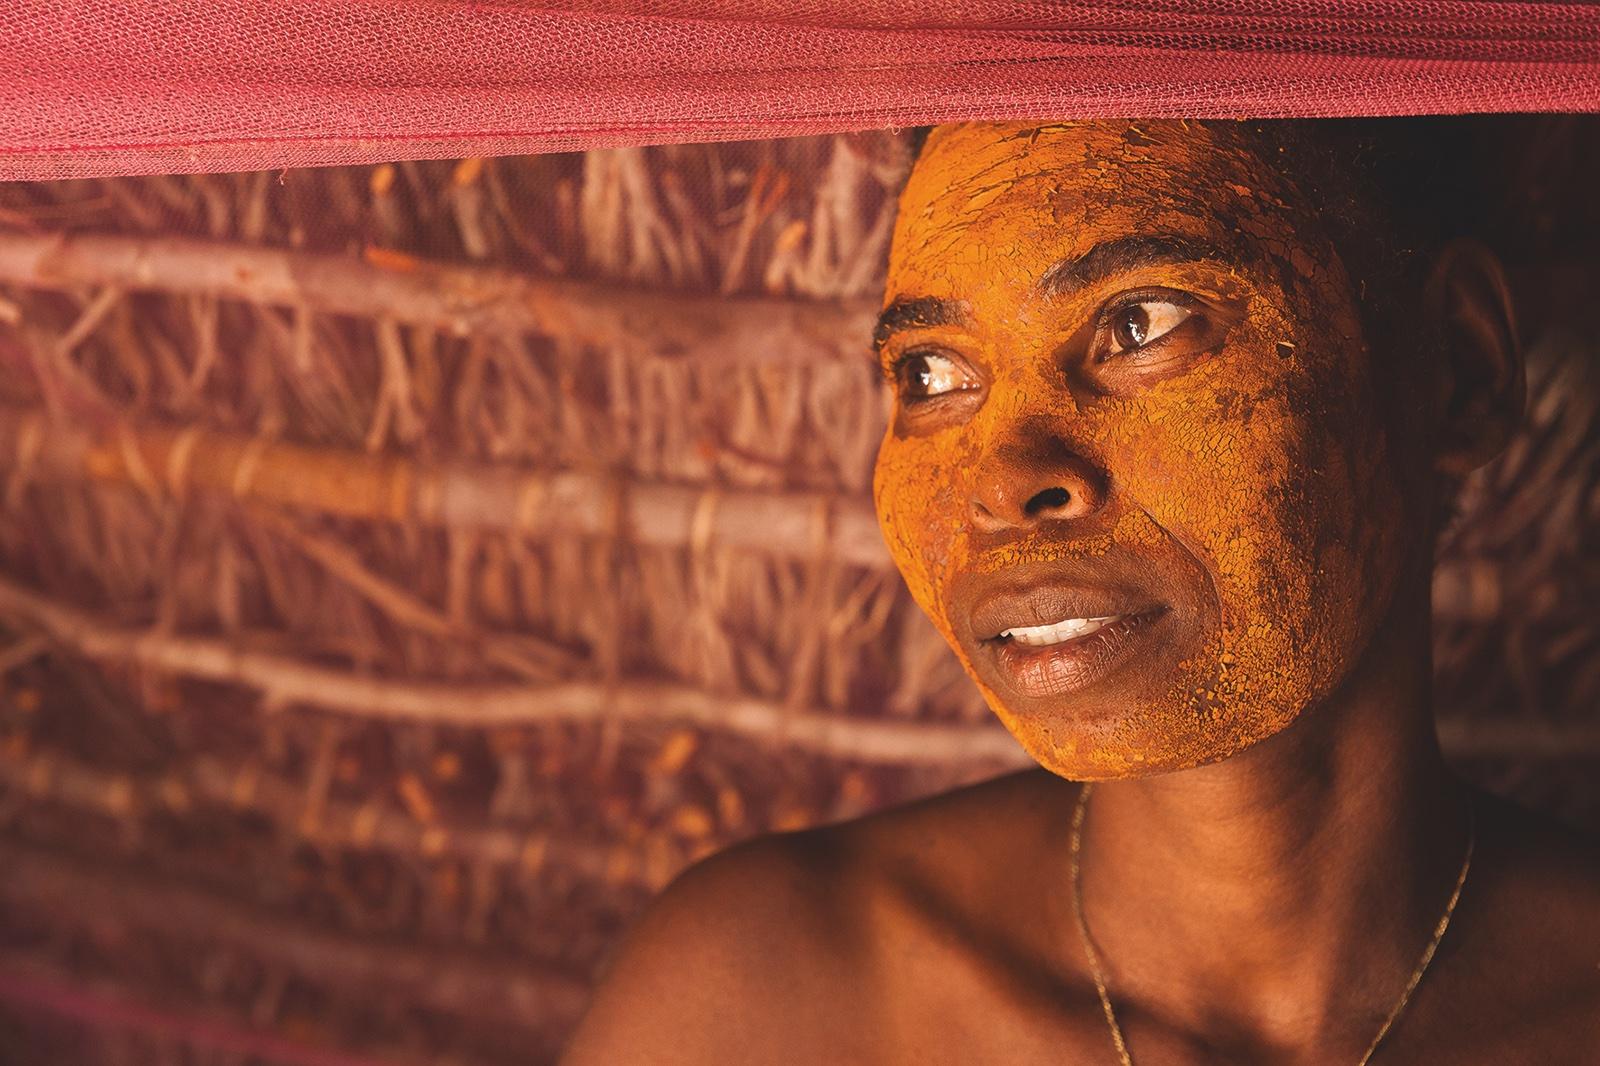 foto:© 2018 Cristina Mittermeier. All rights reserved. www.sealegacy.org -Yolanda, Berenty, Madagascar, January 2009